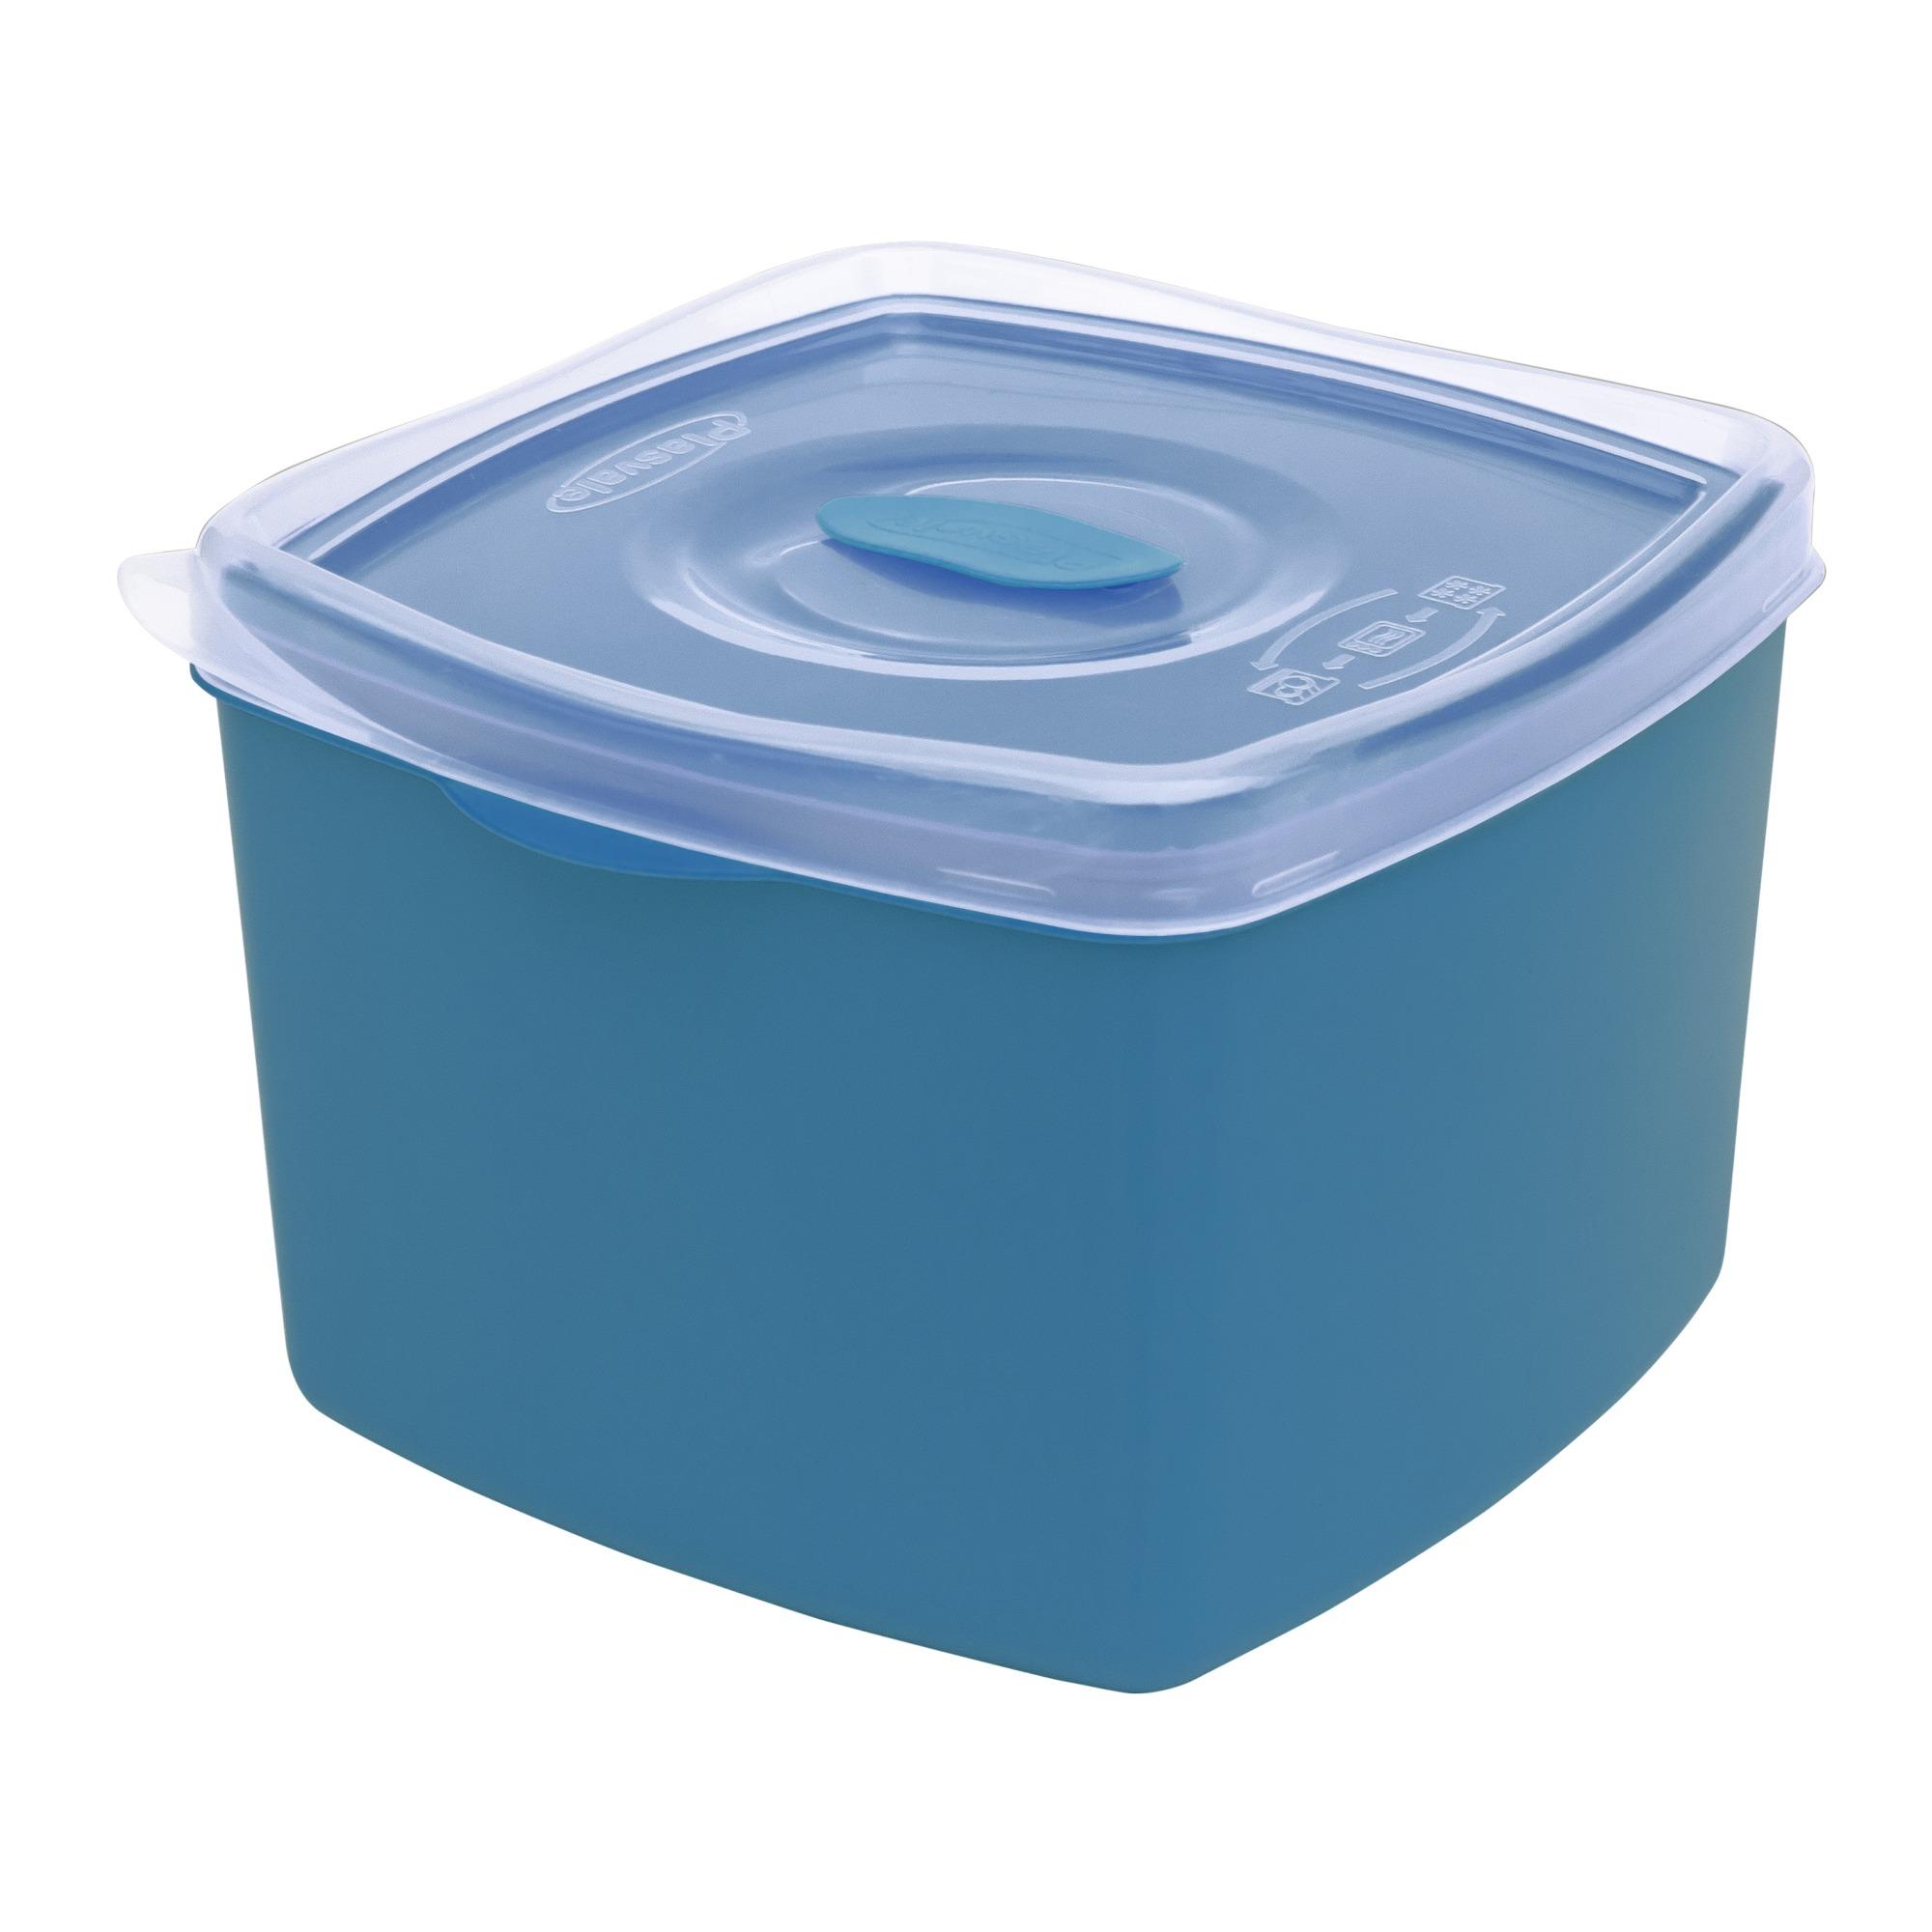 Pote Plastico Hermetico 14L 145x16 cm Cores Sortidas - Plasvale